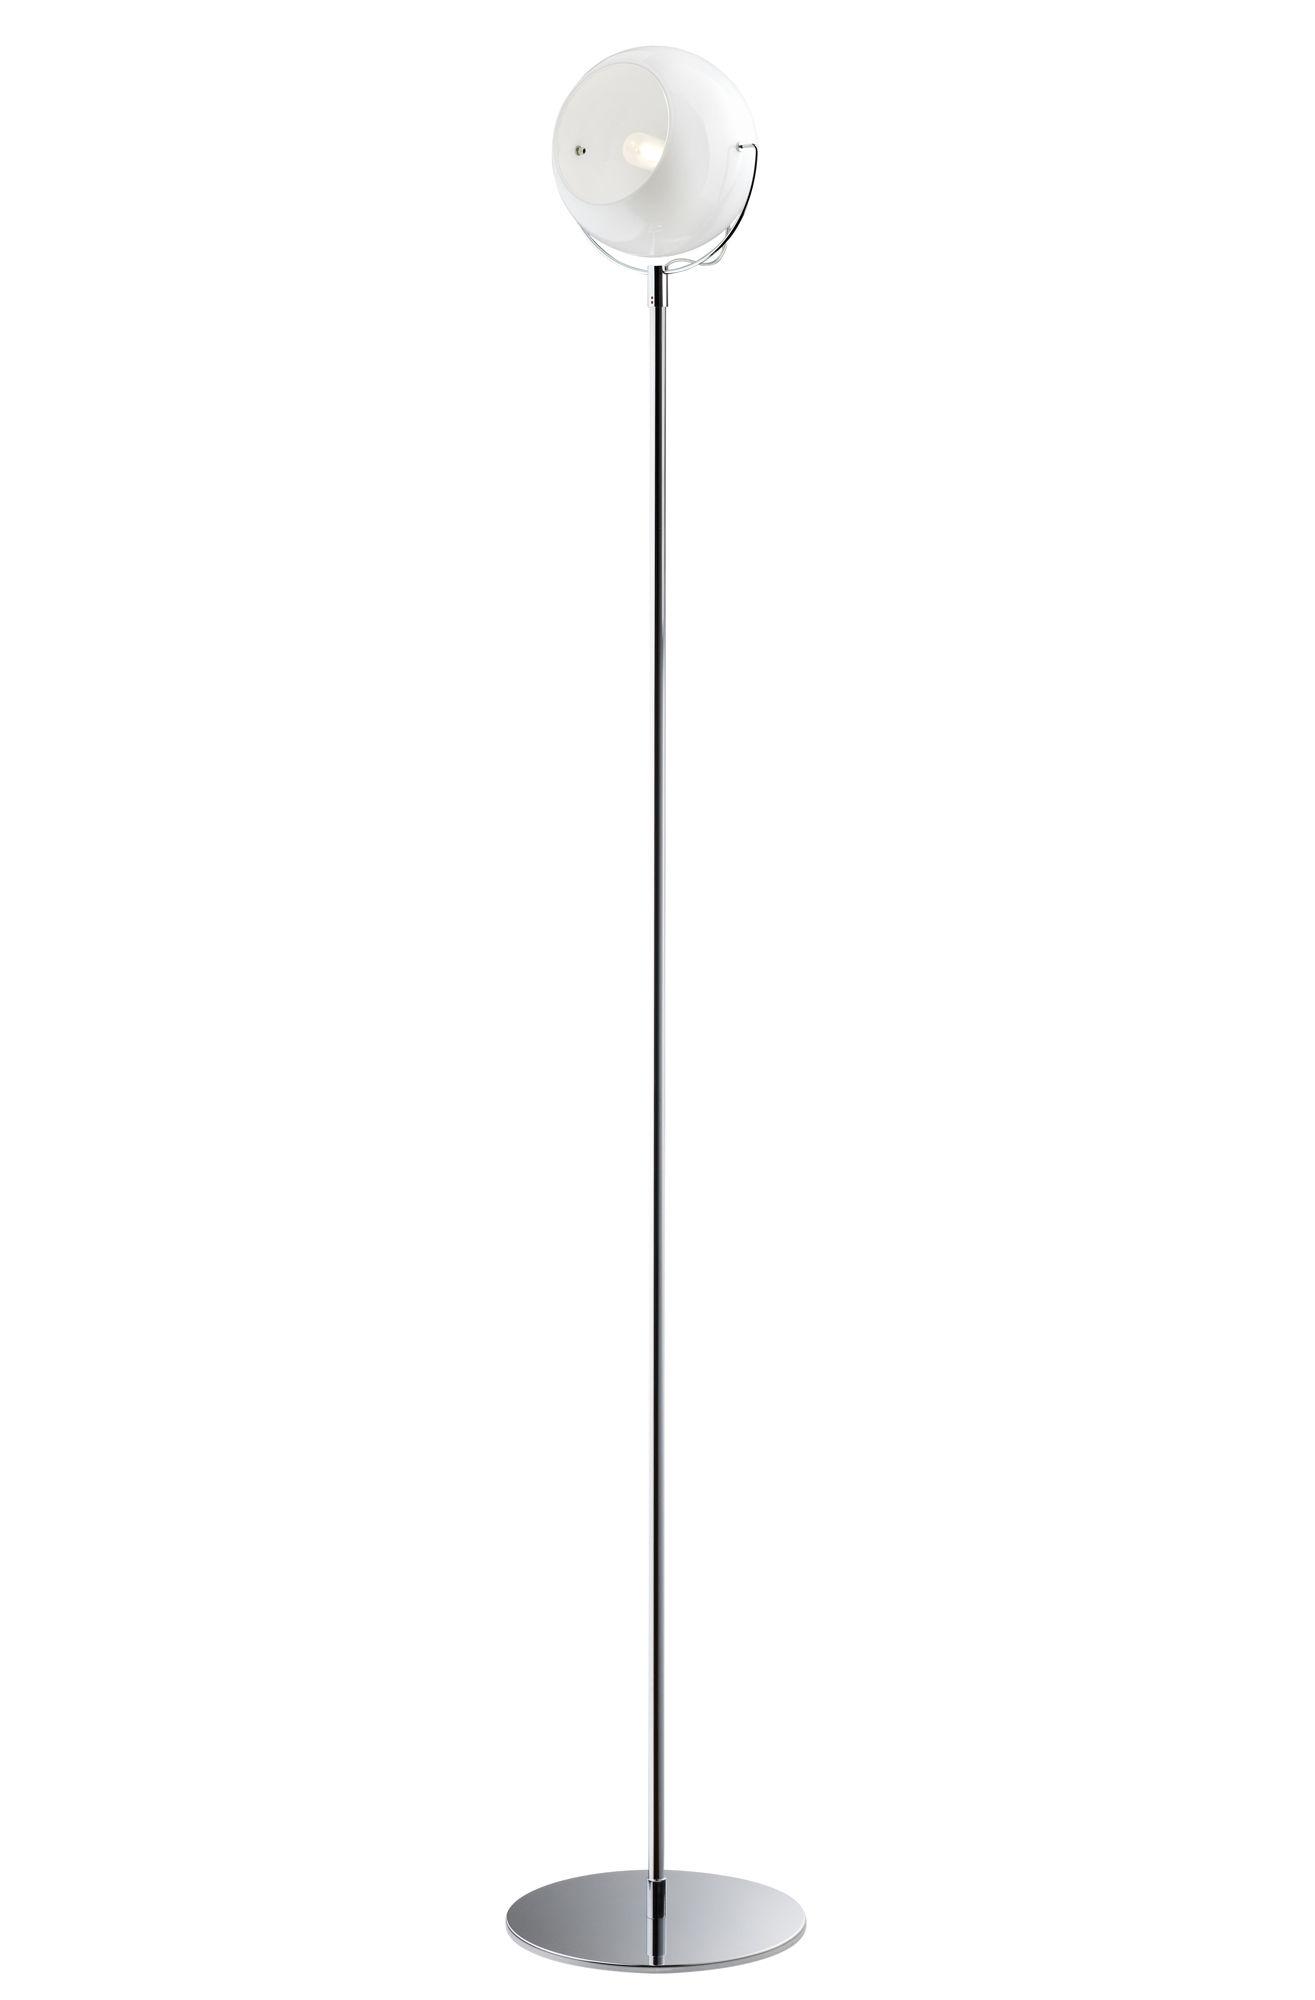 Luminaire - Lampadaires - Lampadaire Beluga Verre blanc / version verre - Fabbian - Verre blanc - Métal chromé, Verre